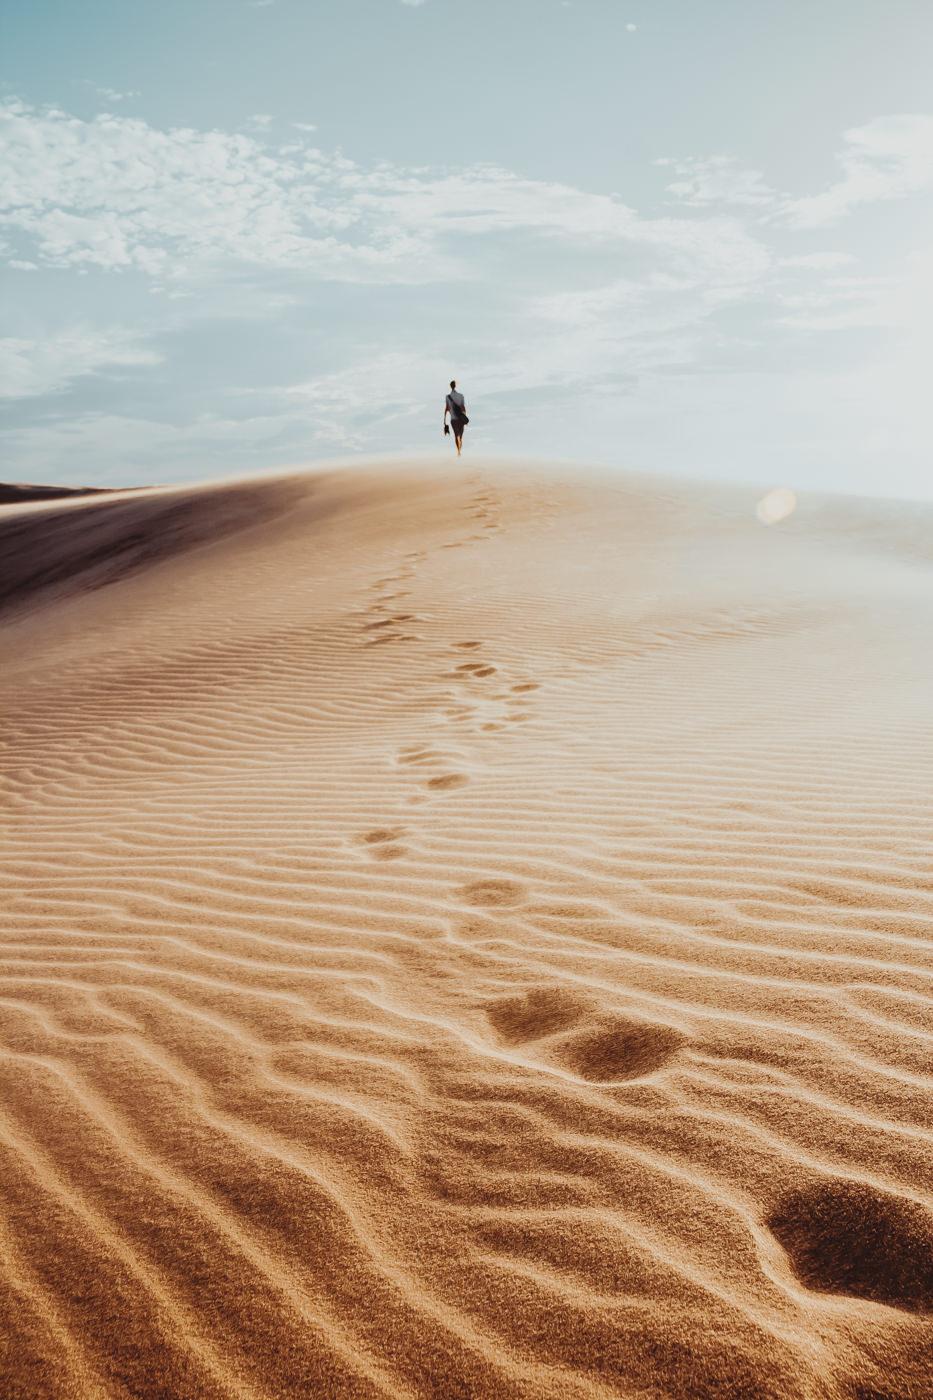 Footprints in The White Dunes of the desert of Mui Ne, Vietnam